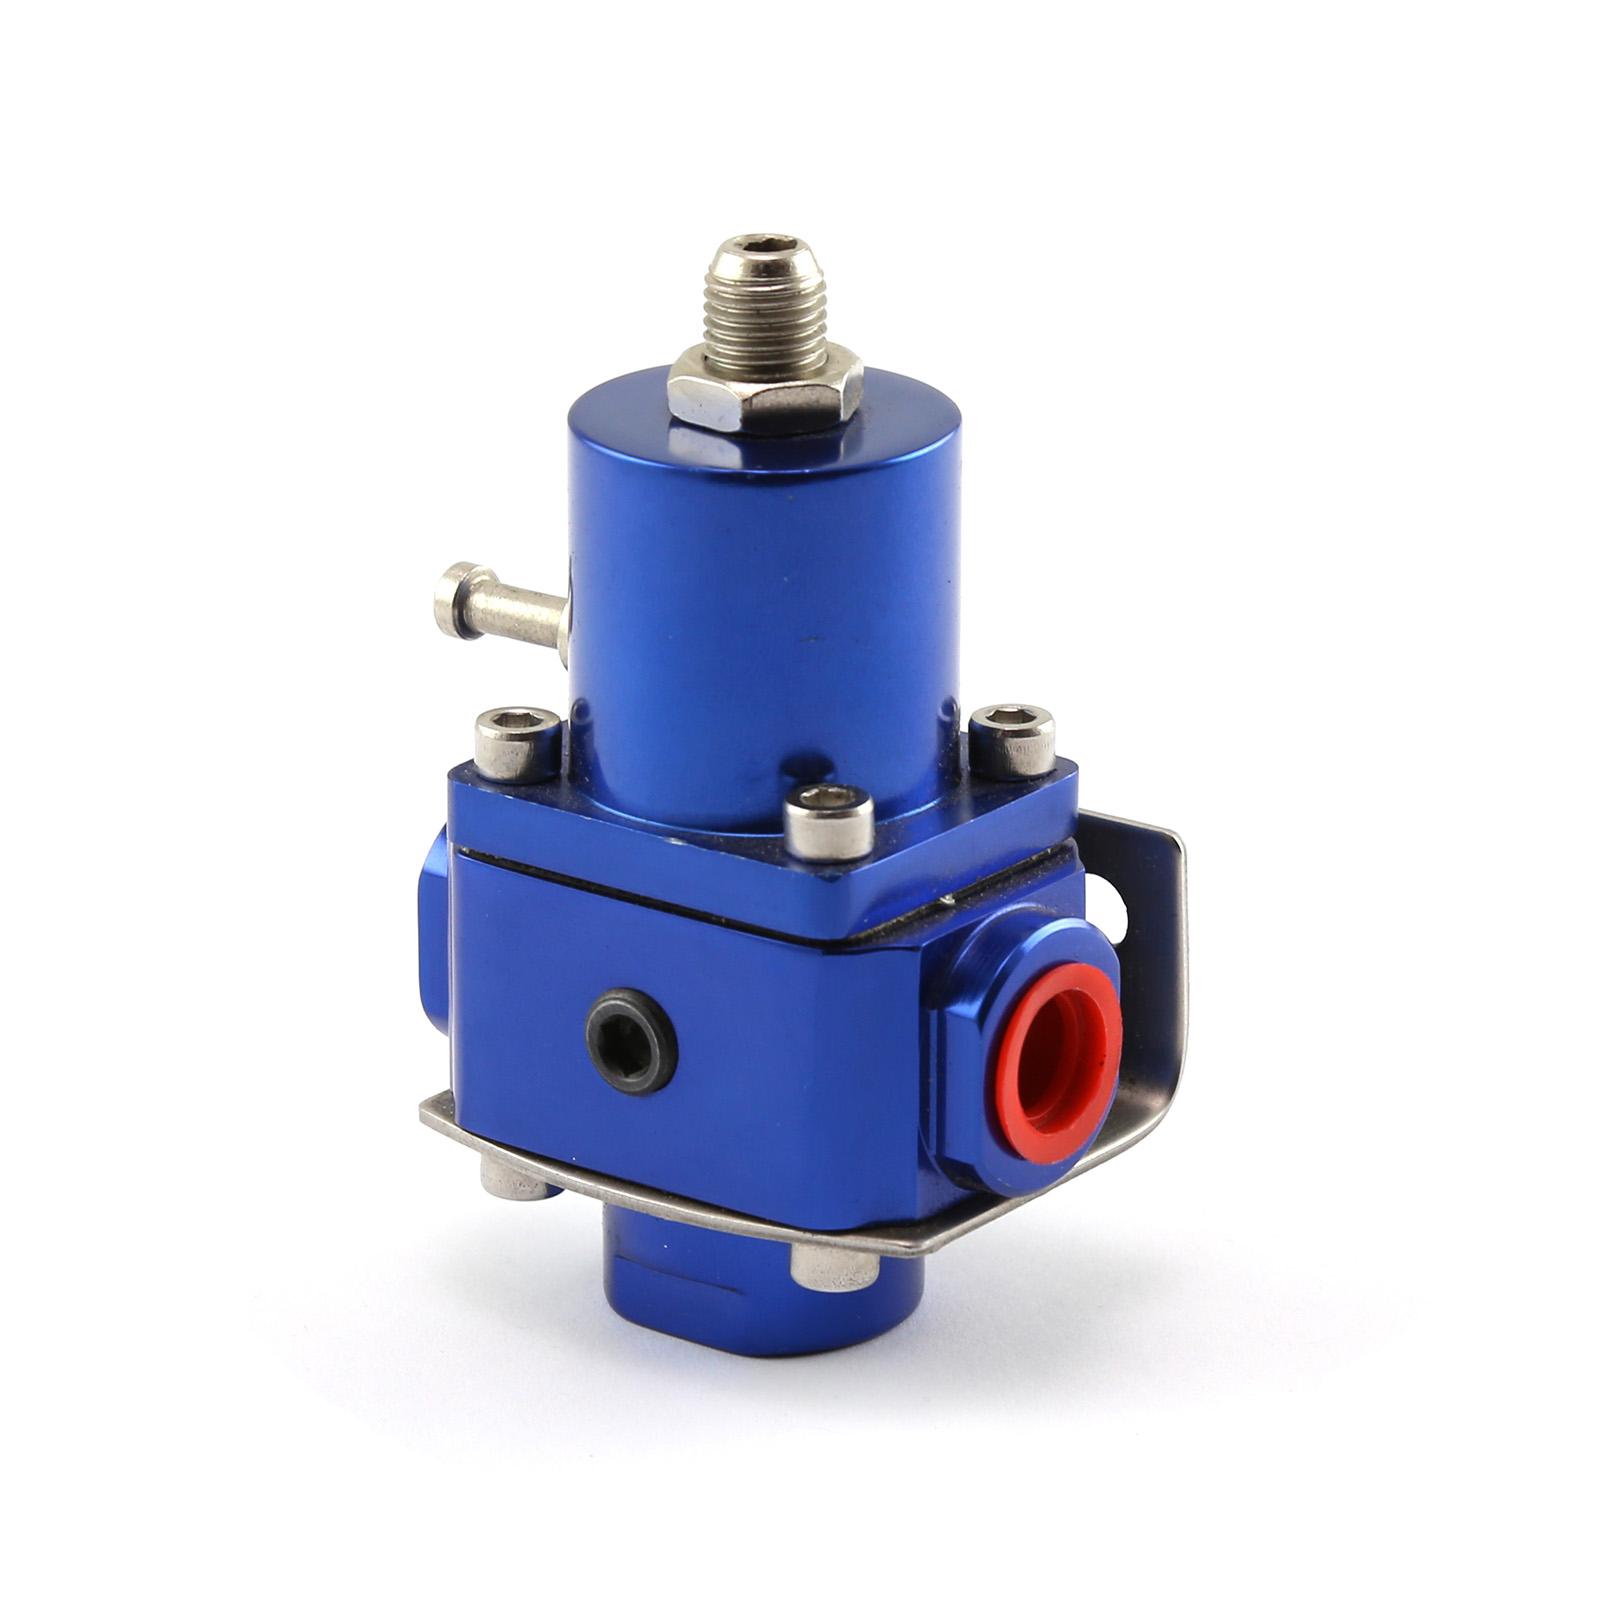 Universal - 10 AN EFI Fuel Pressure Regulator Blue